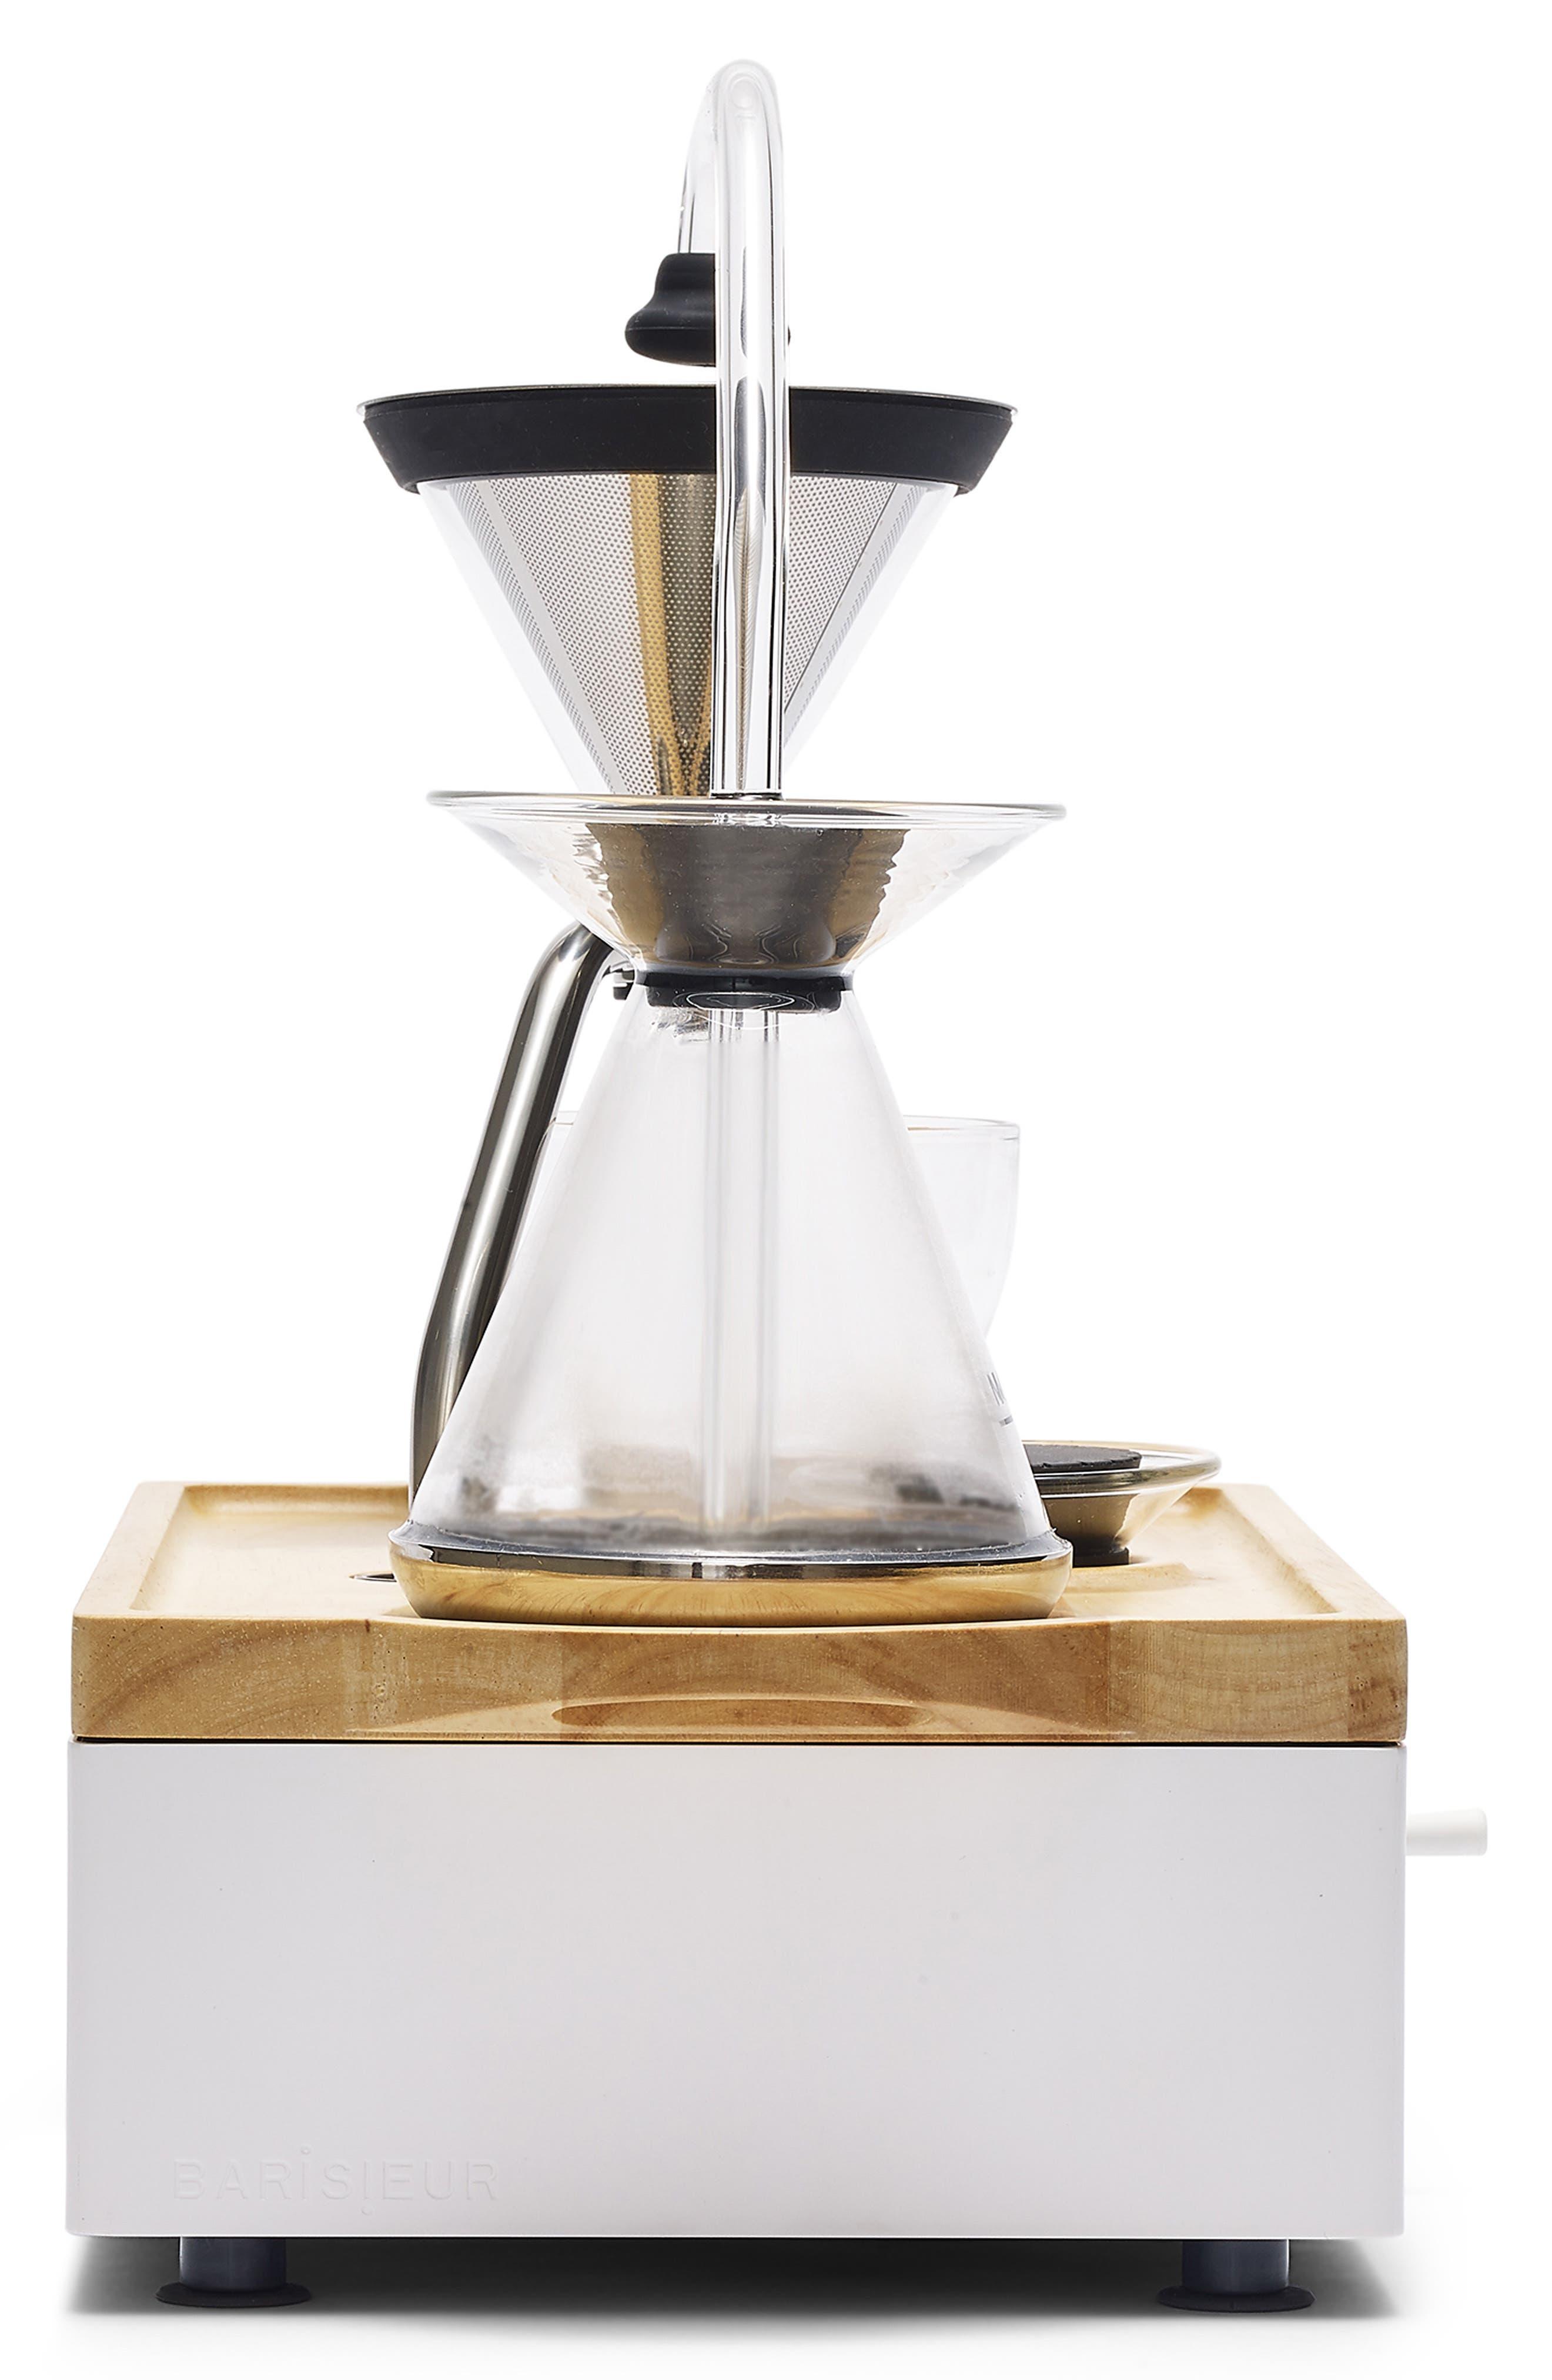 Soda Says x Barisieur Coffee & Tea Alarm Clock,                             Alternate thumbnail 6, color,                             WHITE/ RUBBERWOOD